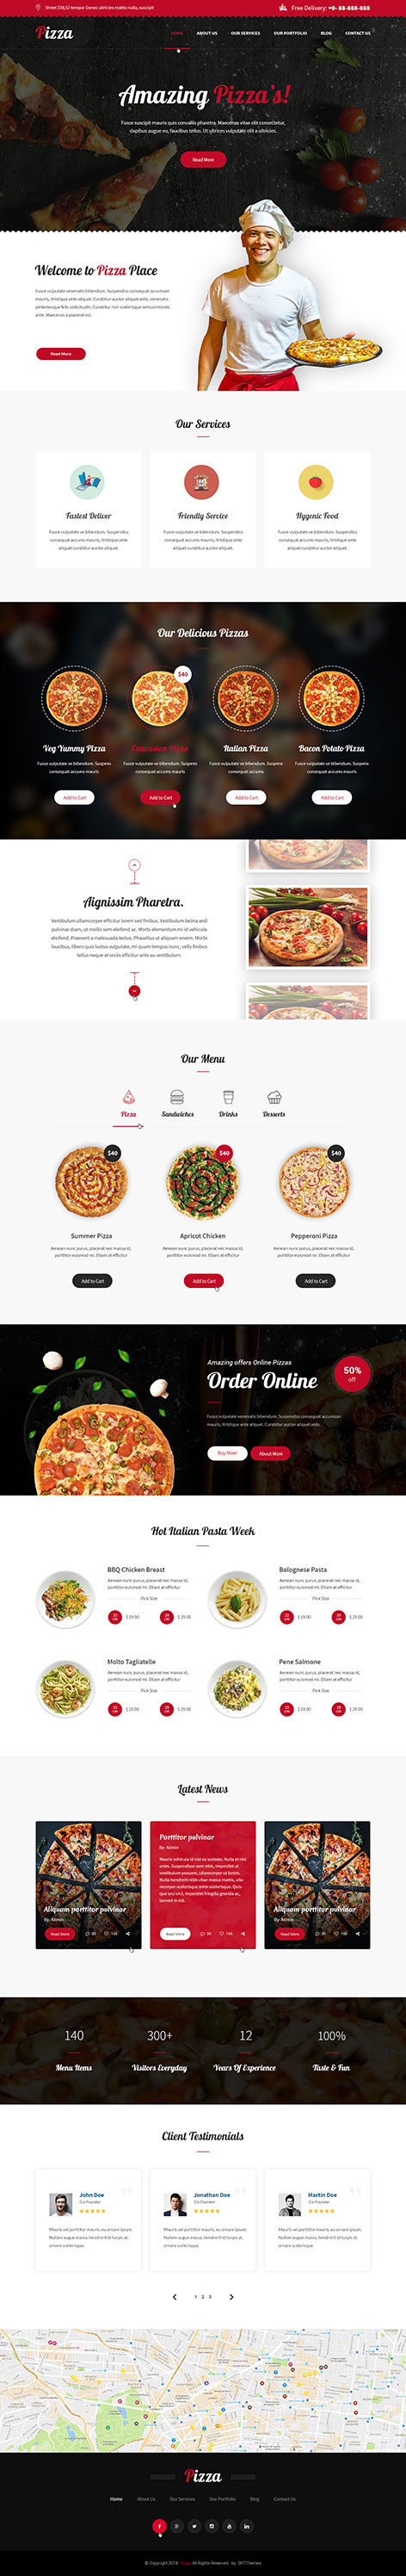 pizza ordering WordPress theme1 - Pizza